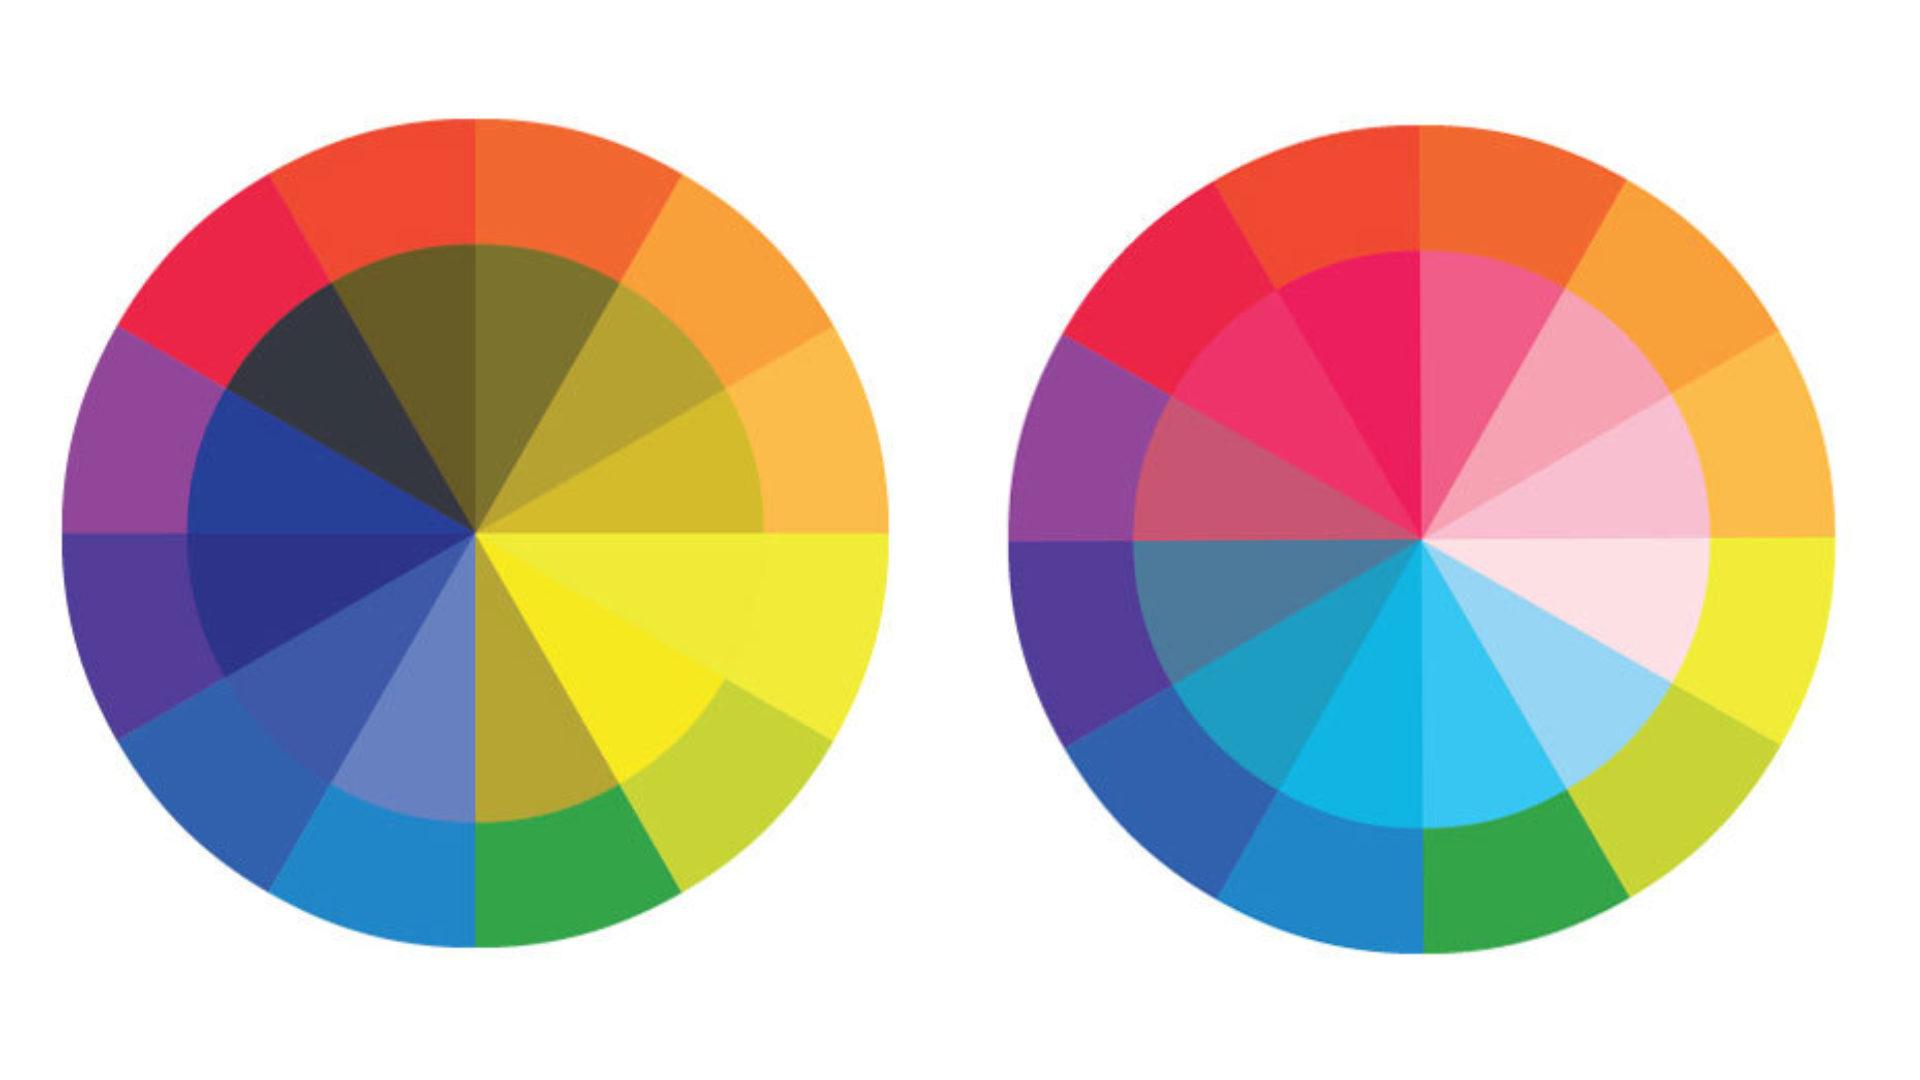 Colour wheels showcasing the Protanopia (left) and Tritanopia (right) kind of colourblindness